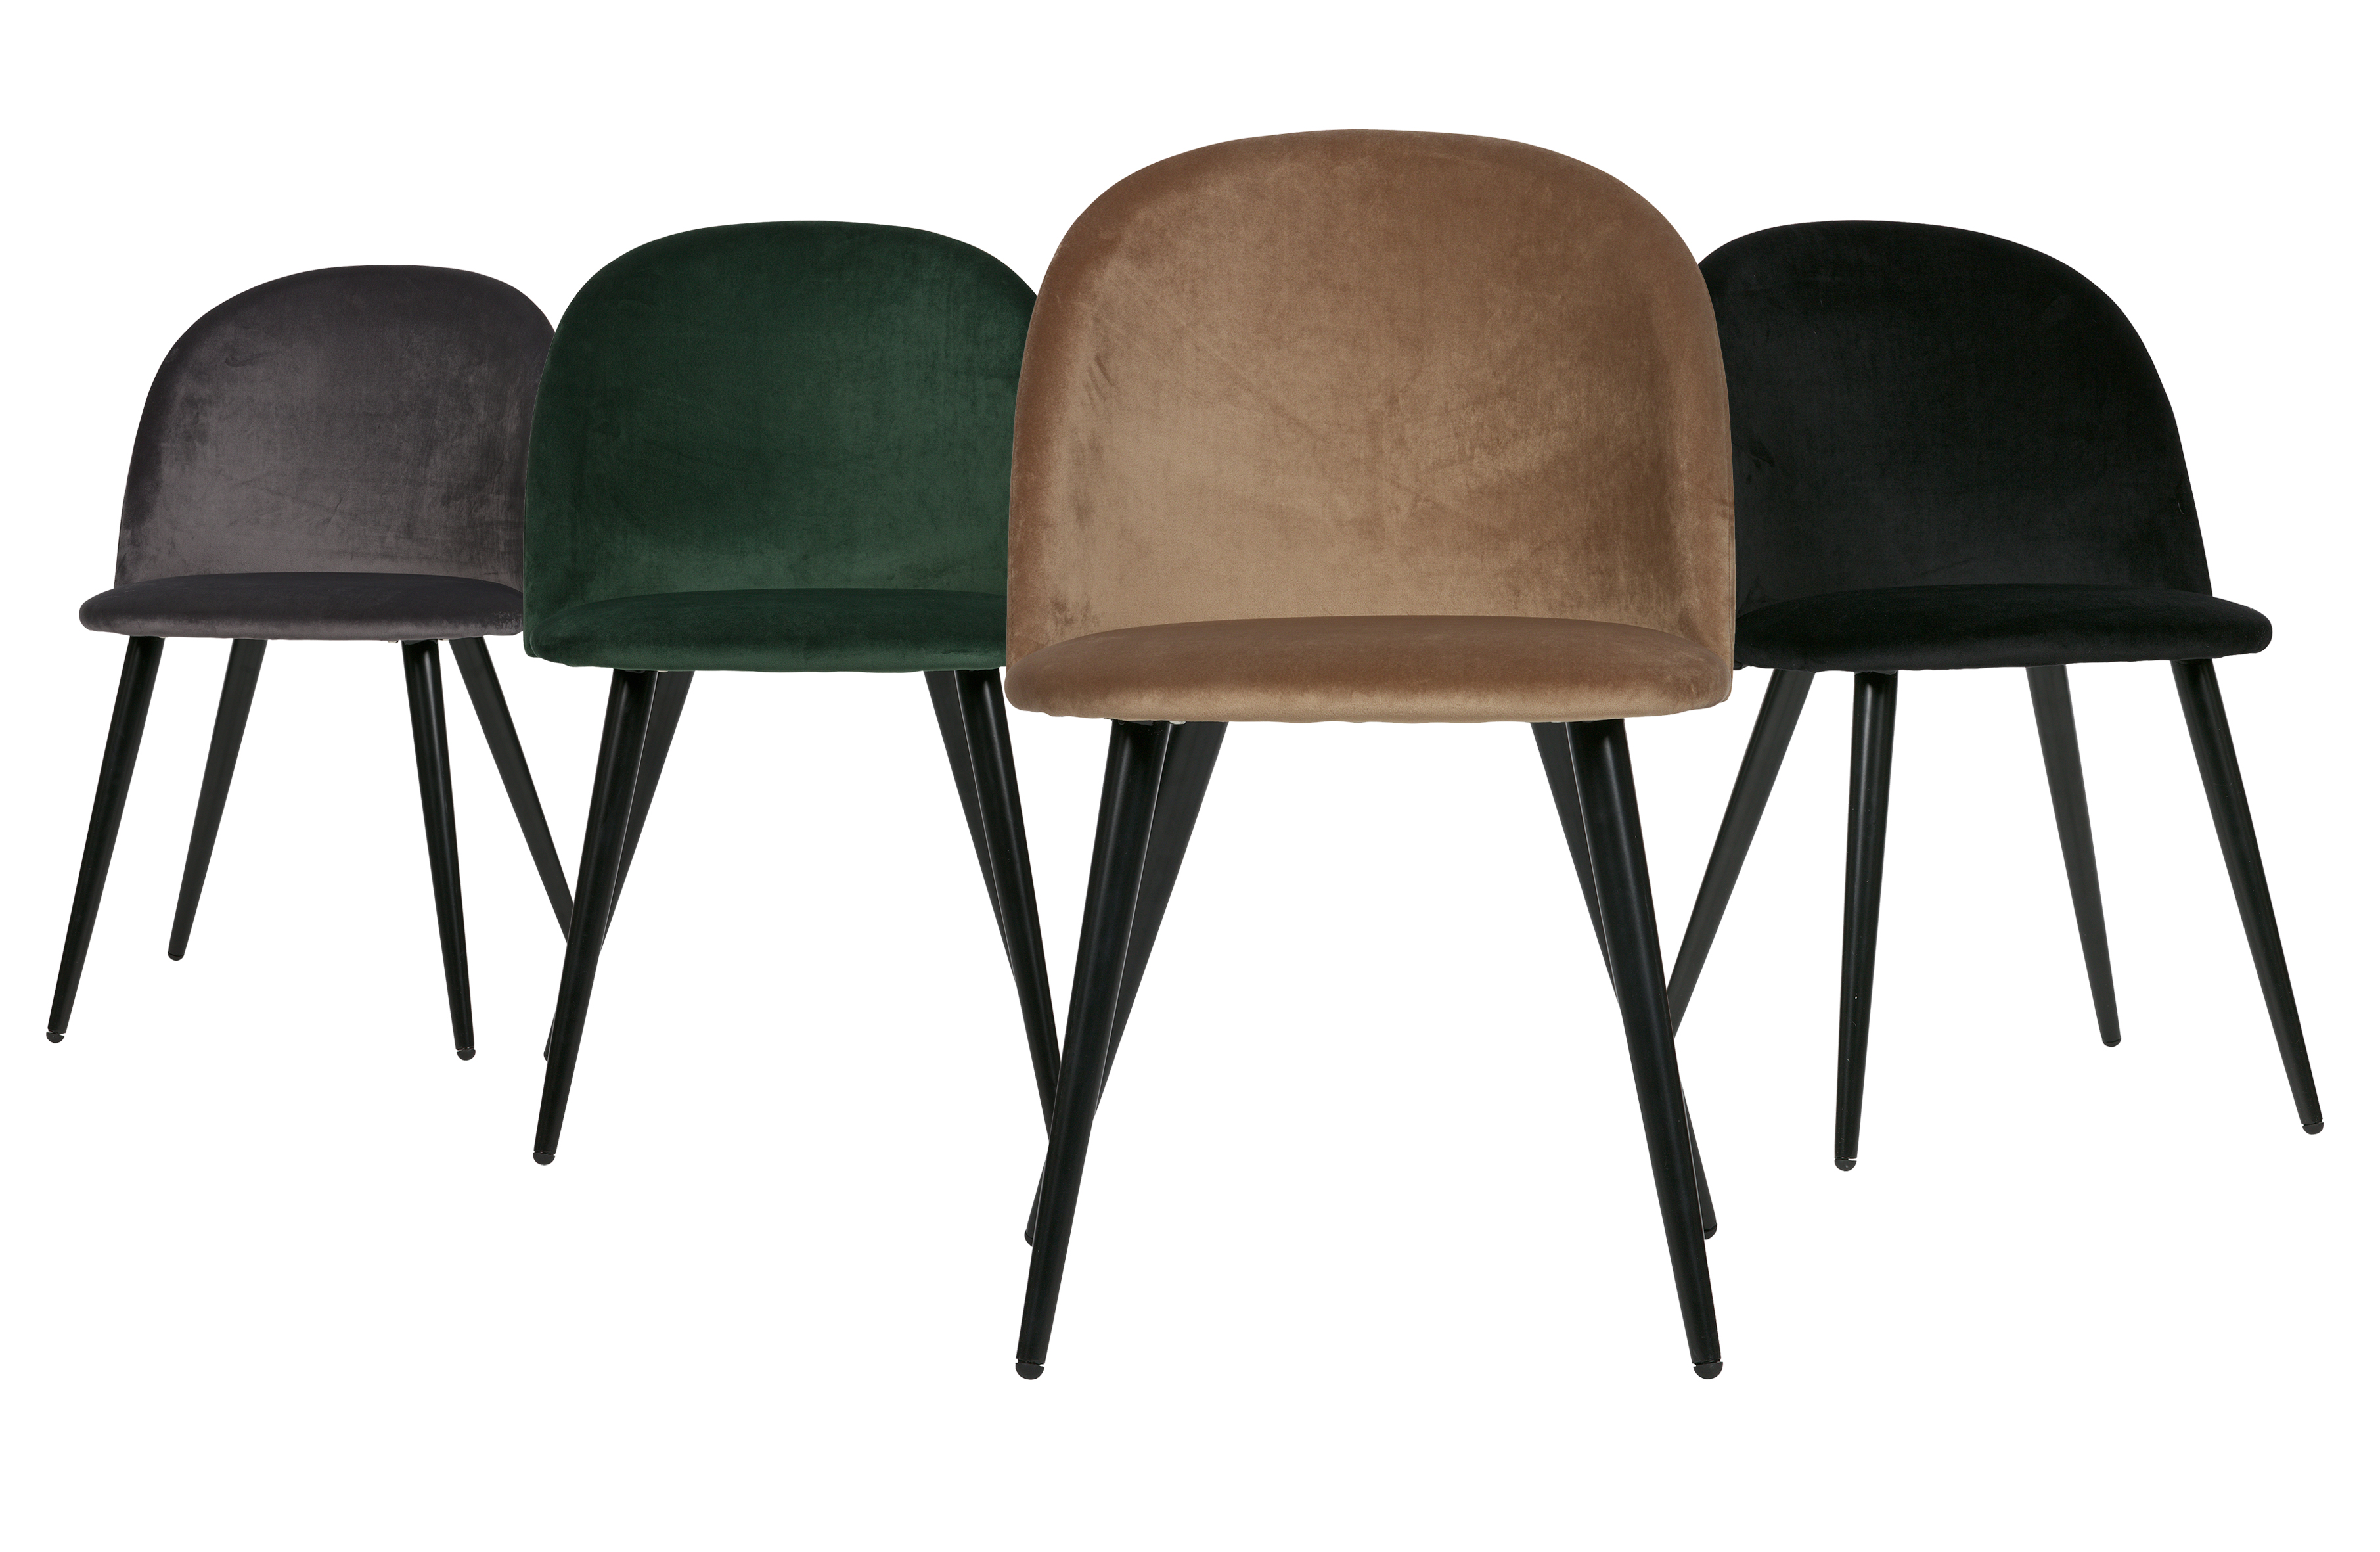 retro m bel im vintagehaus online shop kaufen. Black Bedroom Furniture Sets. Home Design Ideas